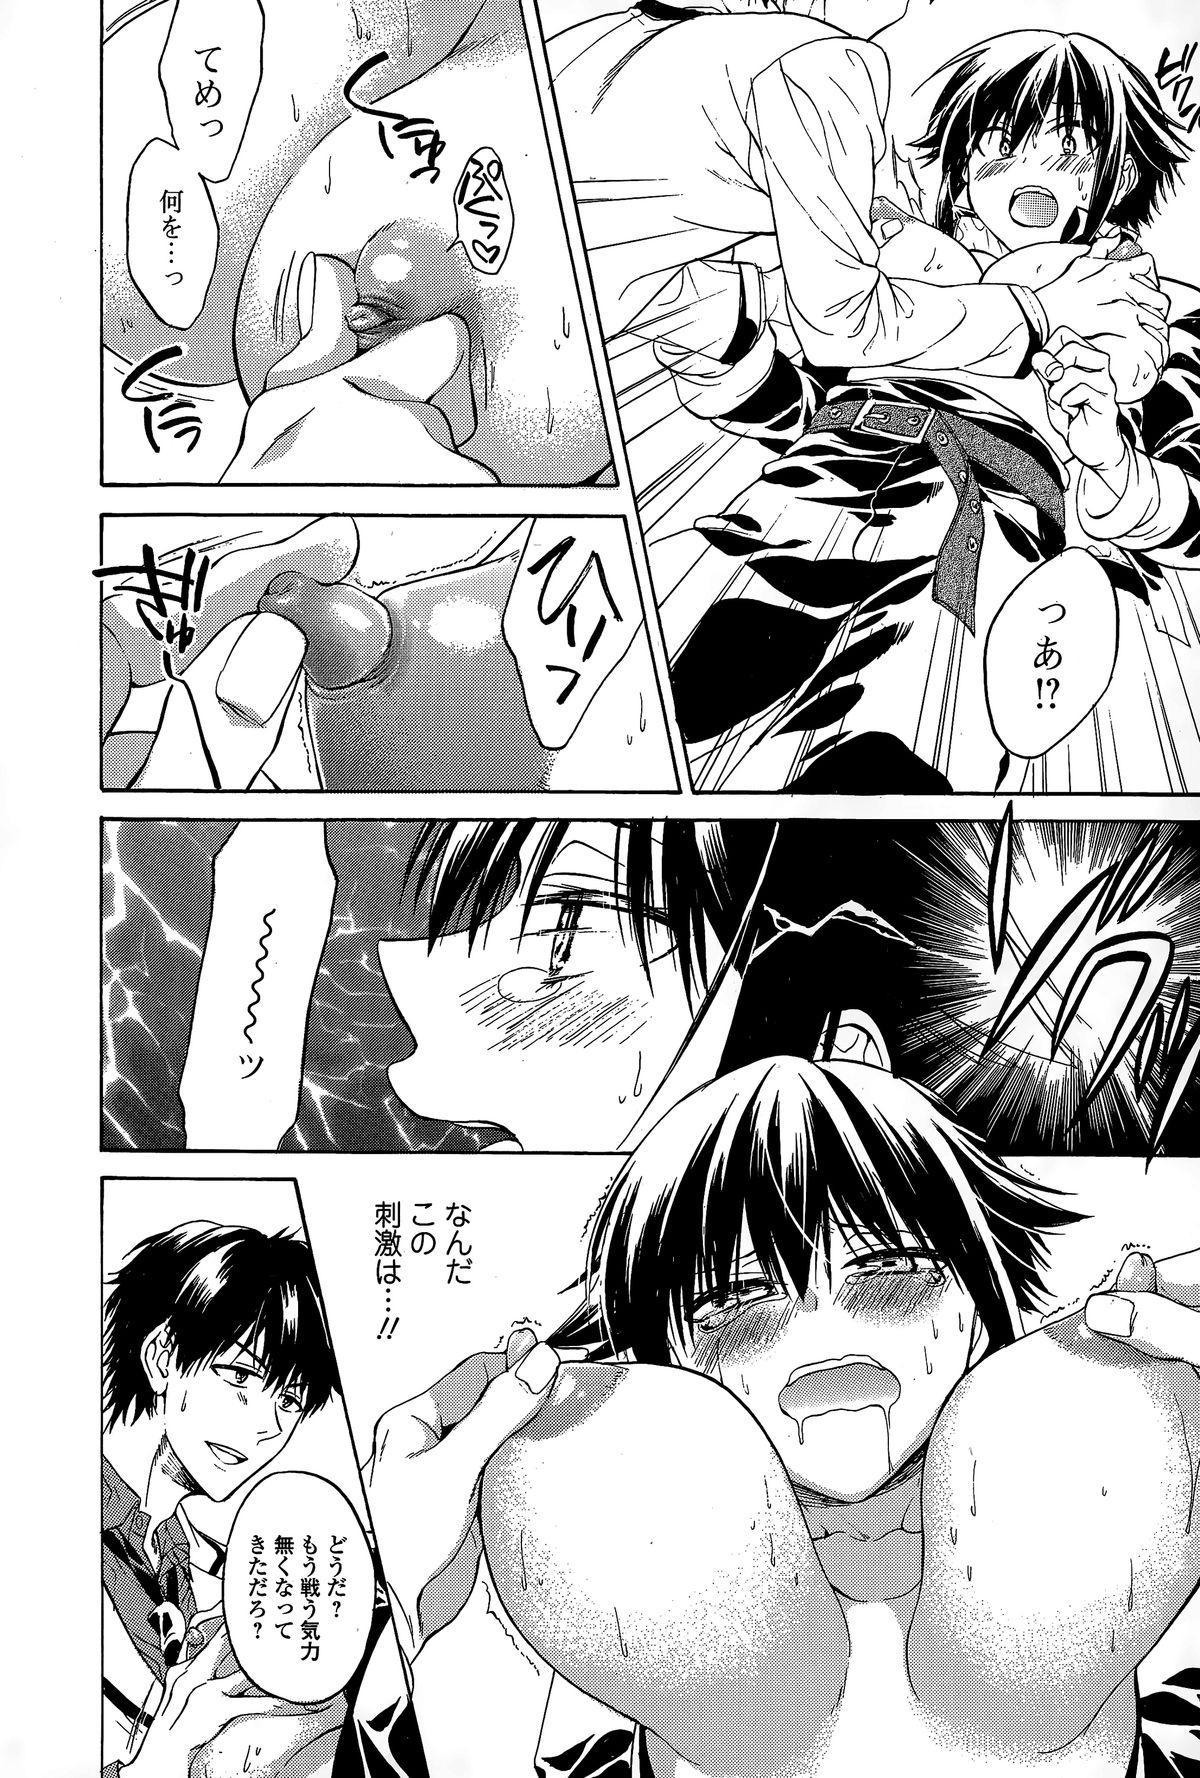 Comic Toutetsu 2015-02 Vol. 3 109